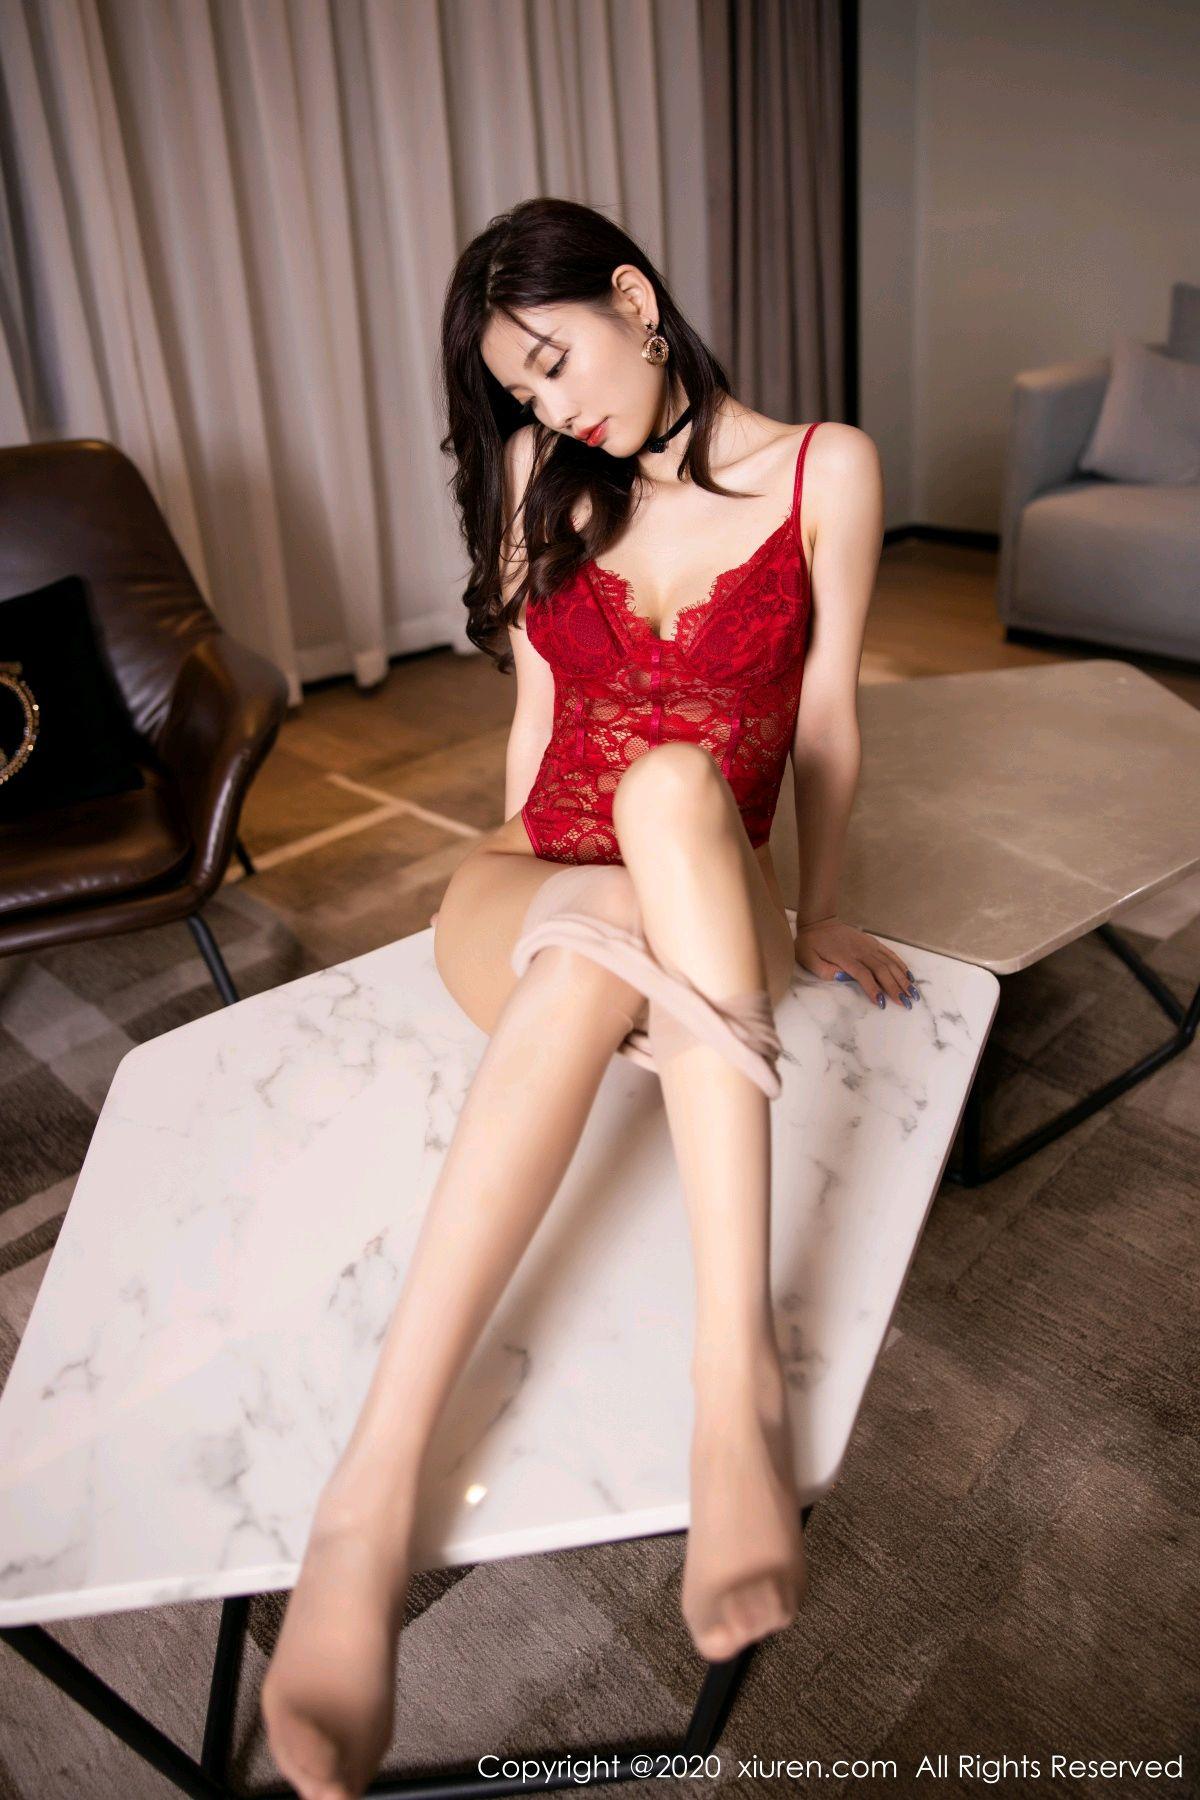 [XiuRen] Vol.2671 Yang Chen Chen 67P, Underwear, Xiuren, Yang Chen Chen